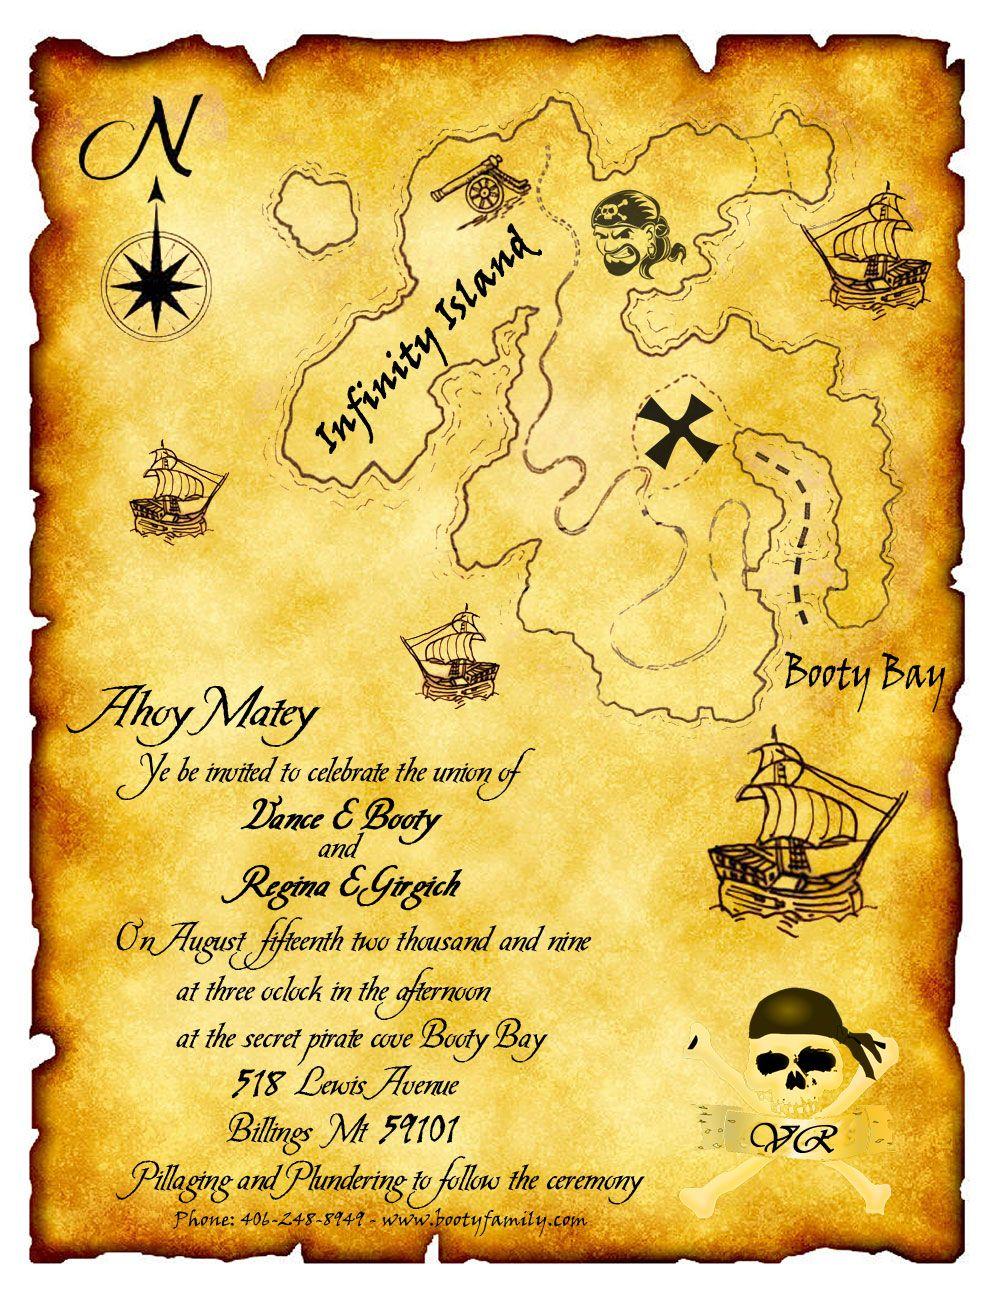 Pirate Wedding Invitation What A Fun Idea For The Home